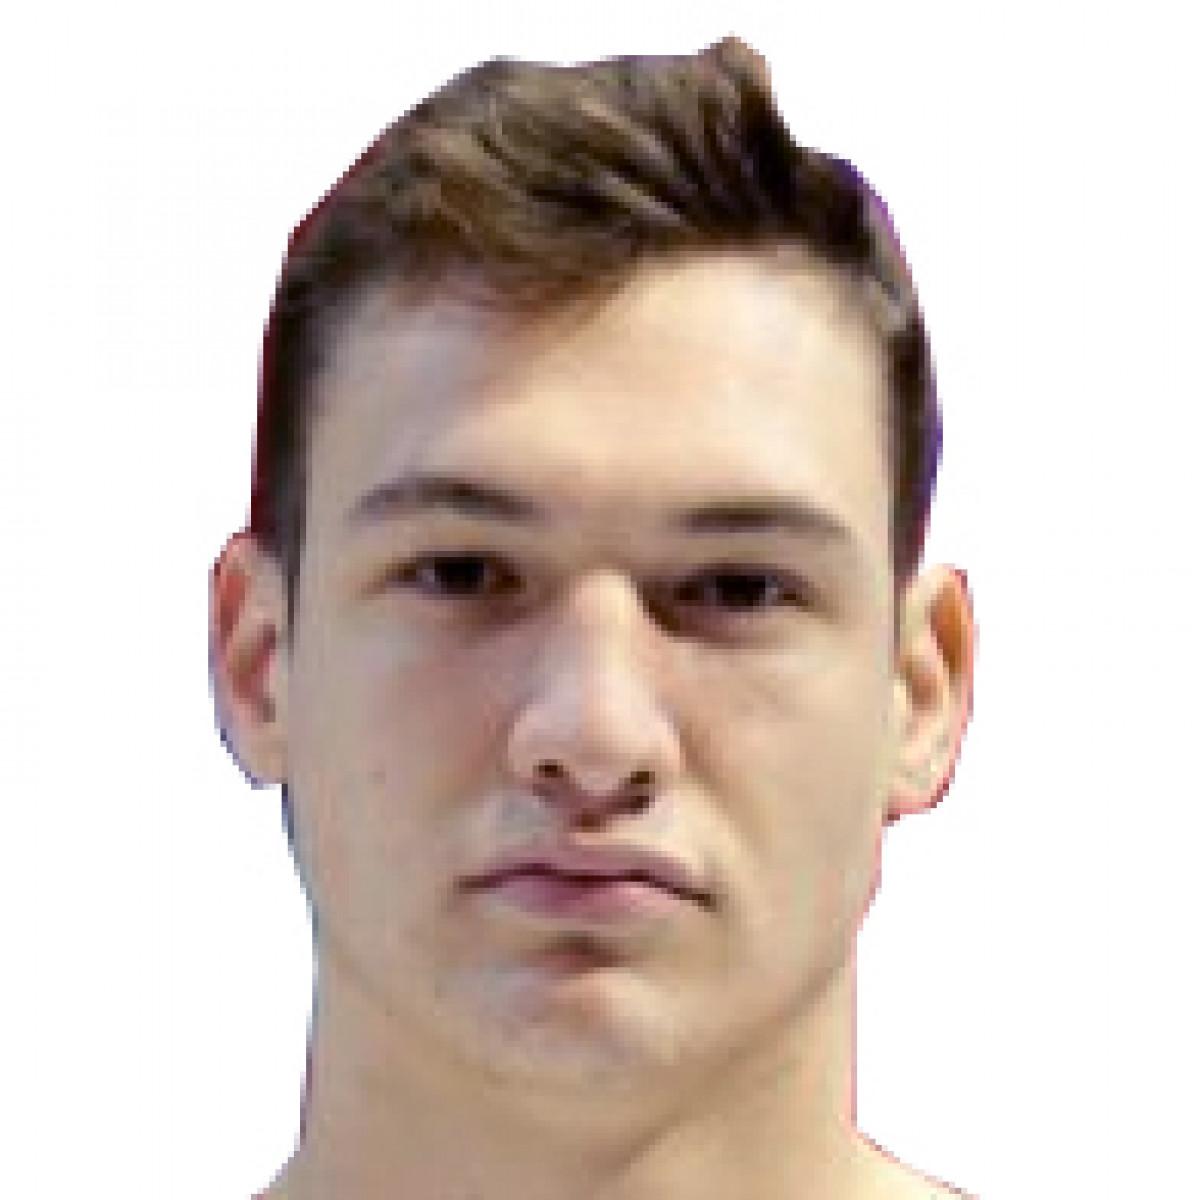 Jason Dimitrakopoulos